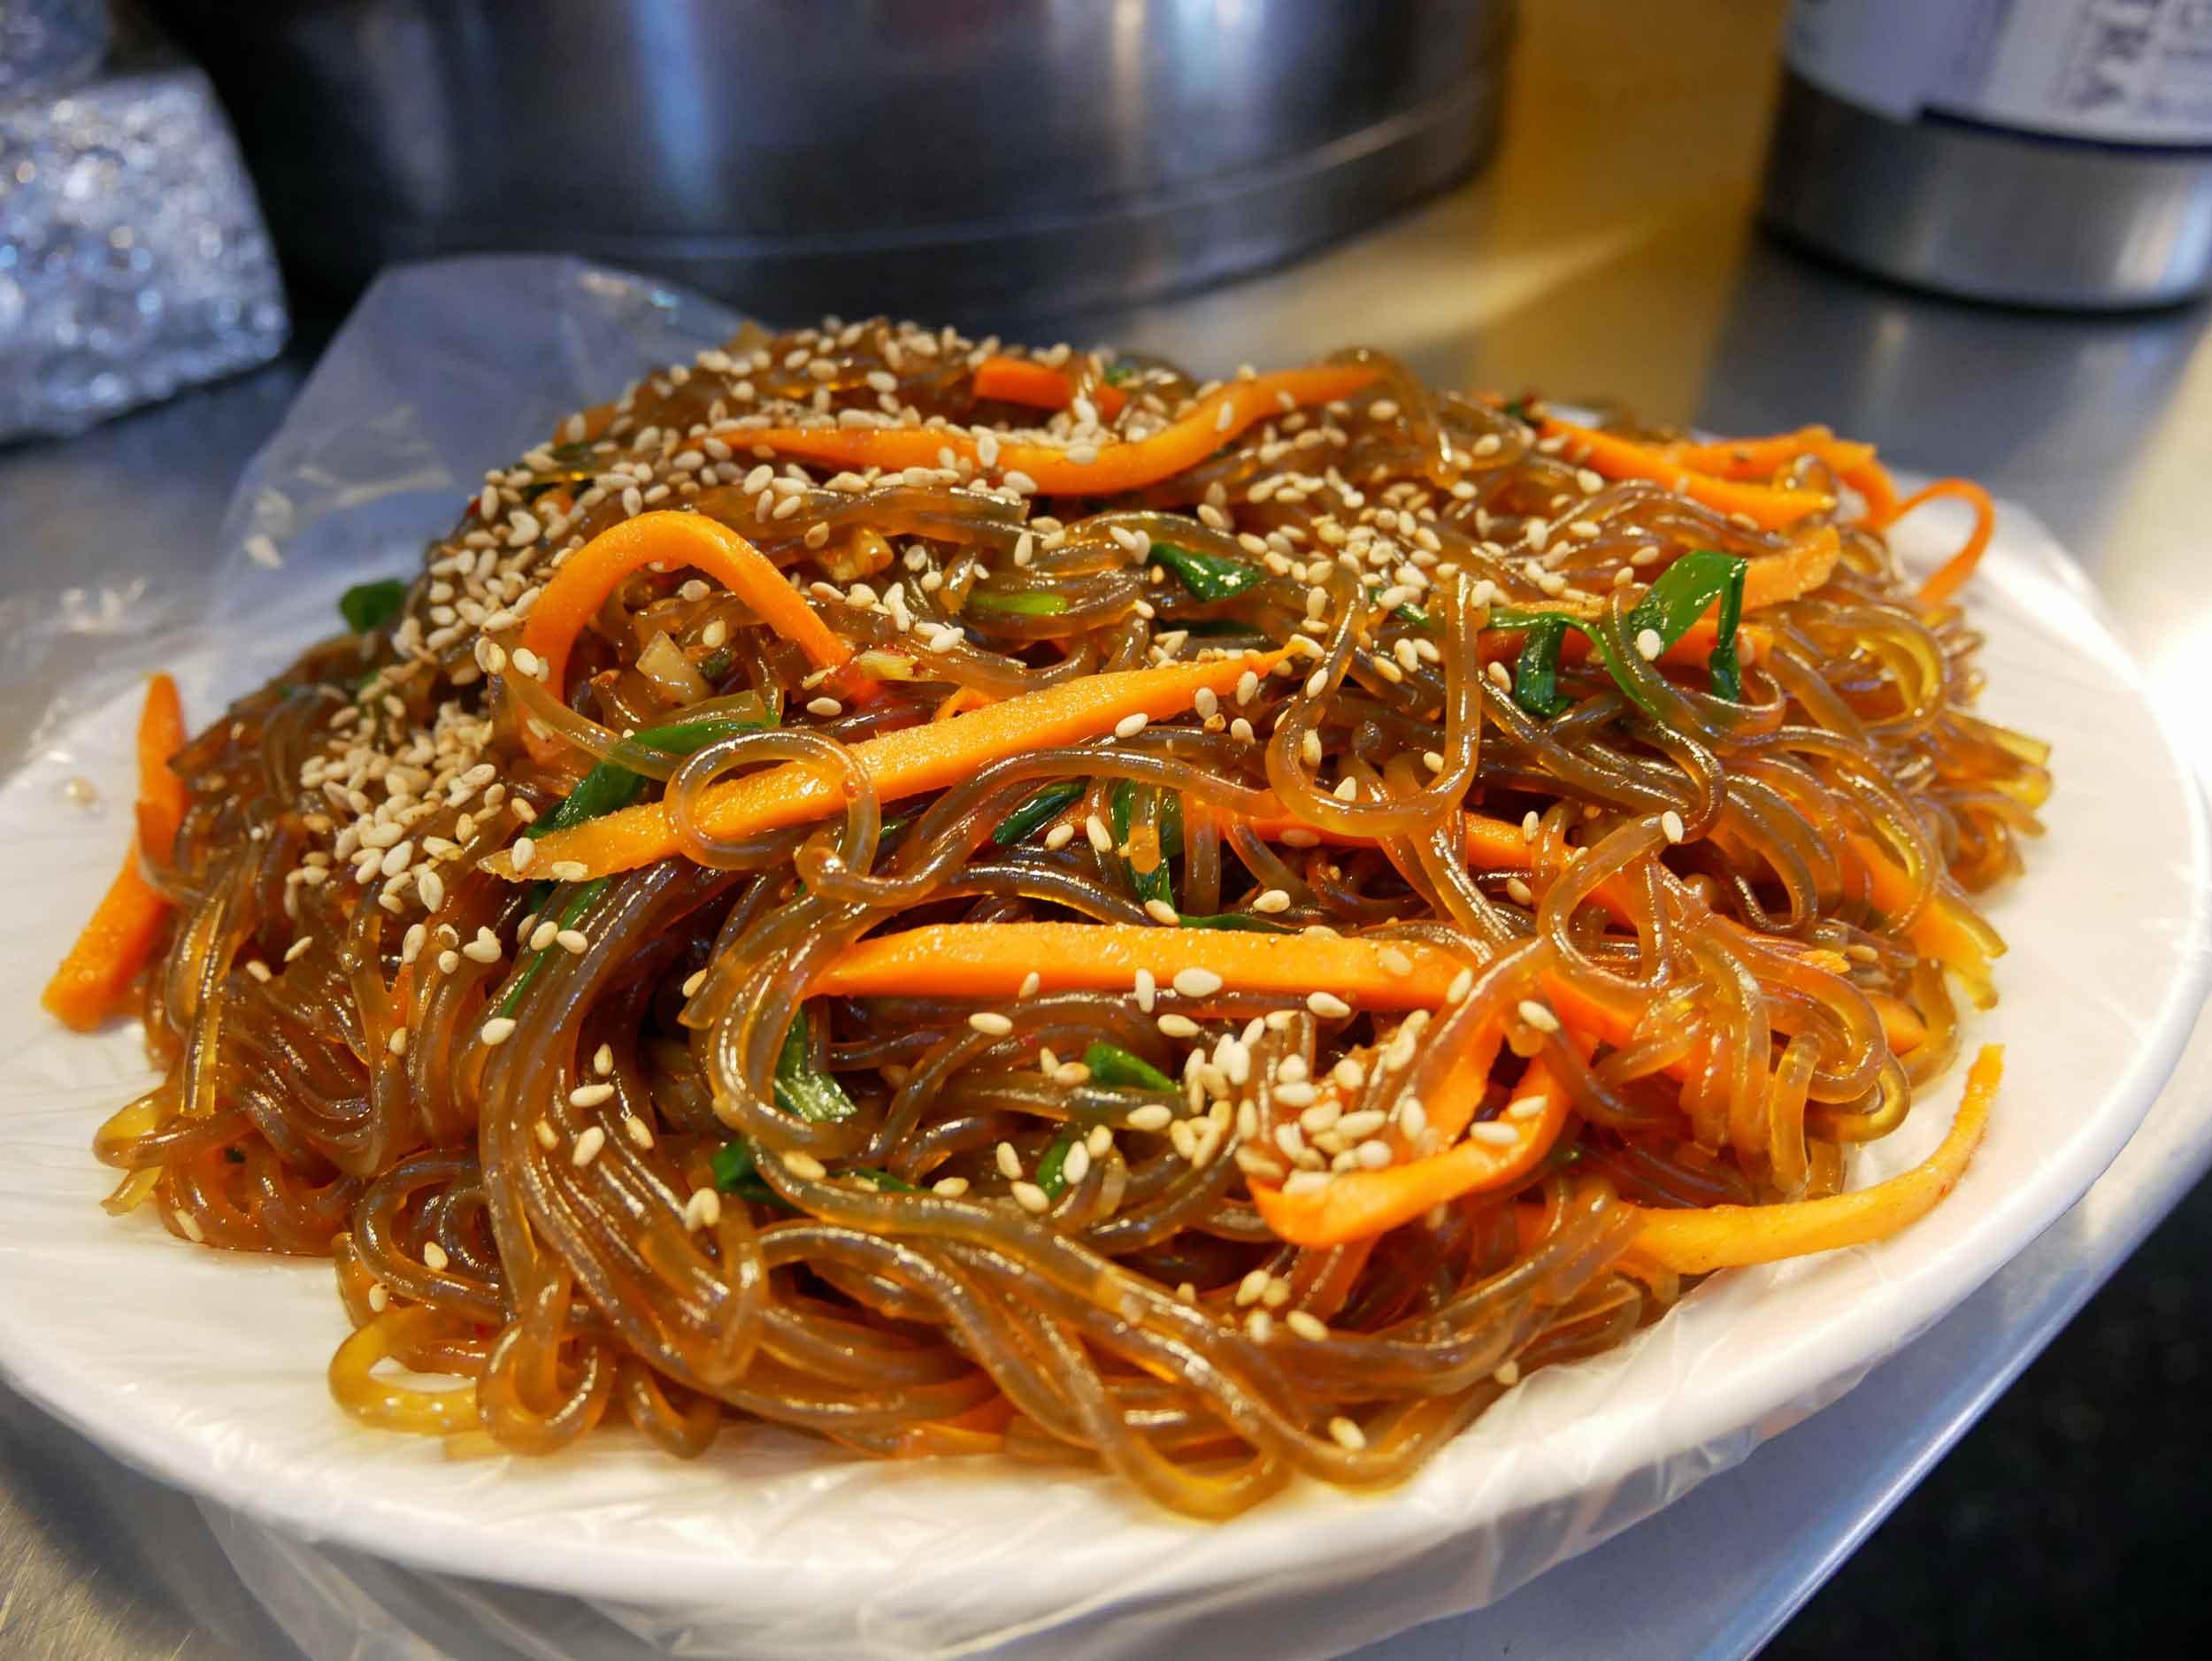 As well as slurping down  japchae , or Korean glass noodle stir fry.